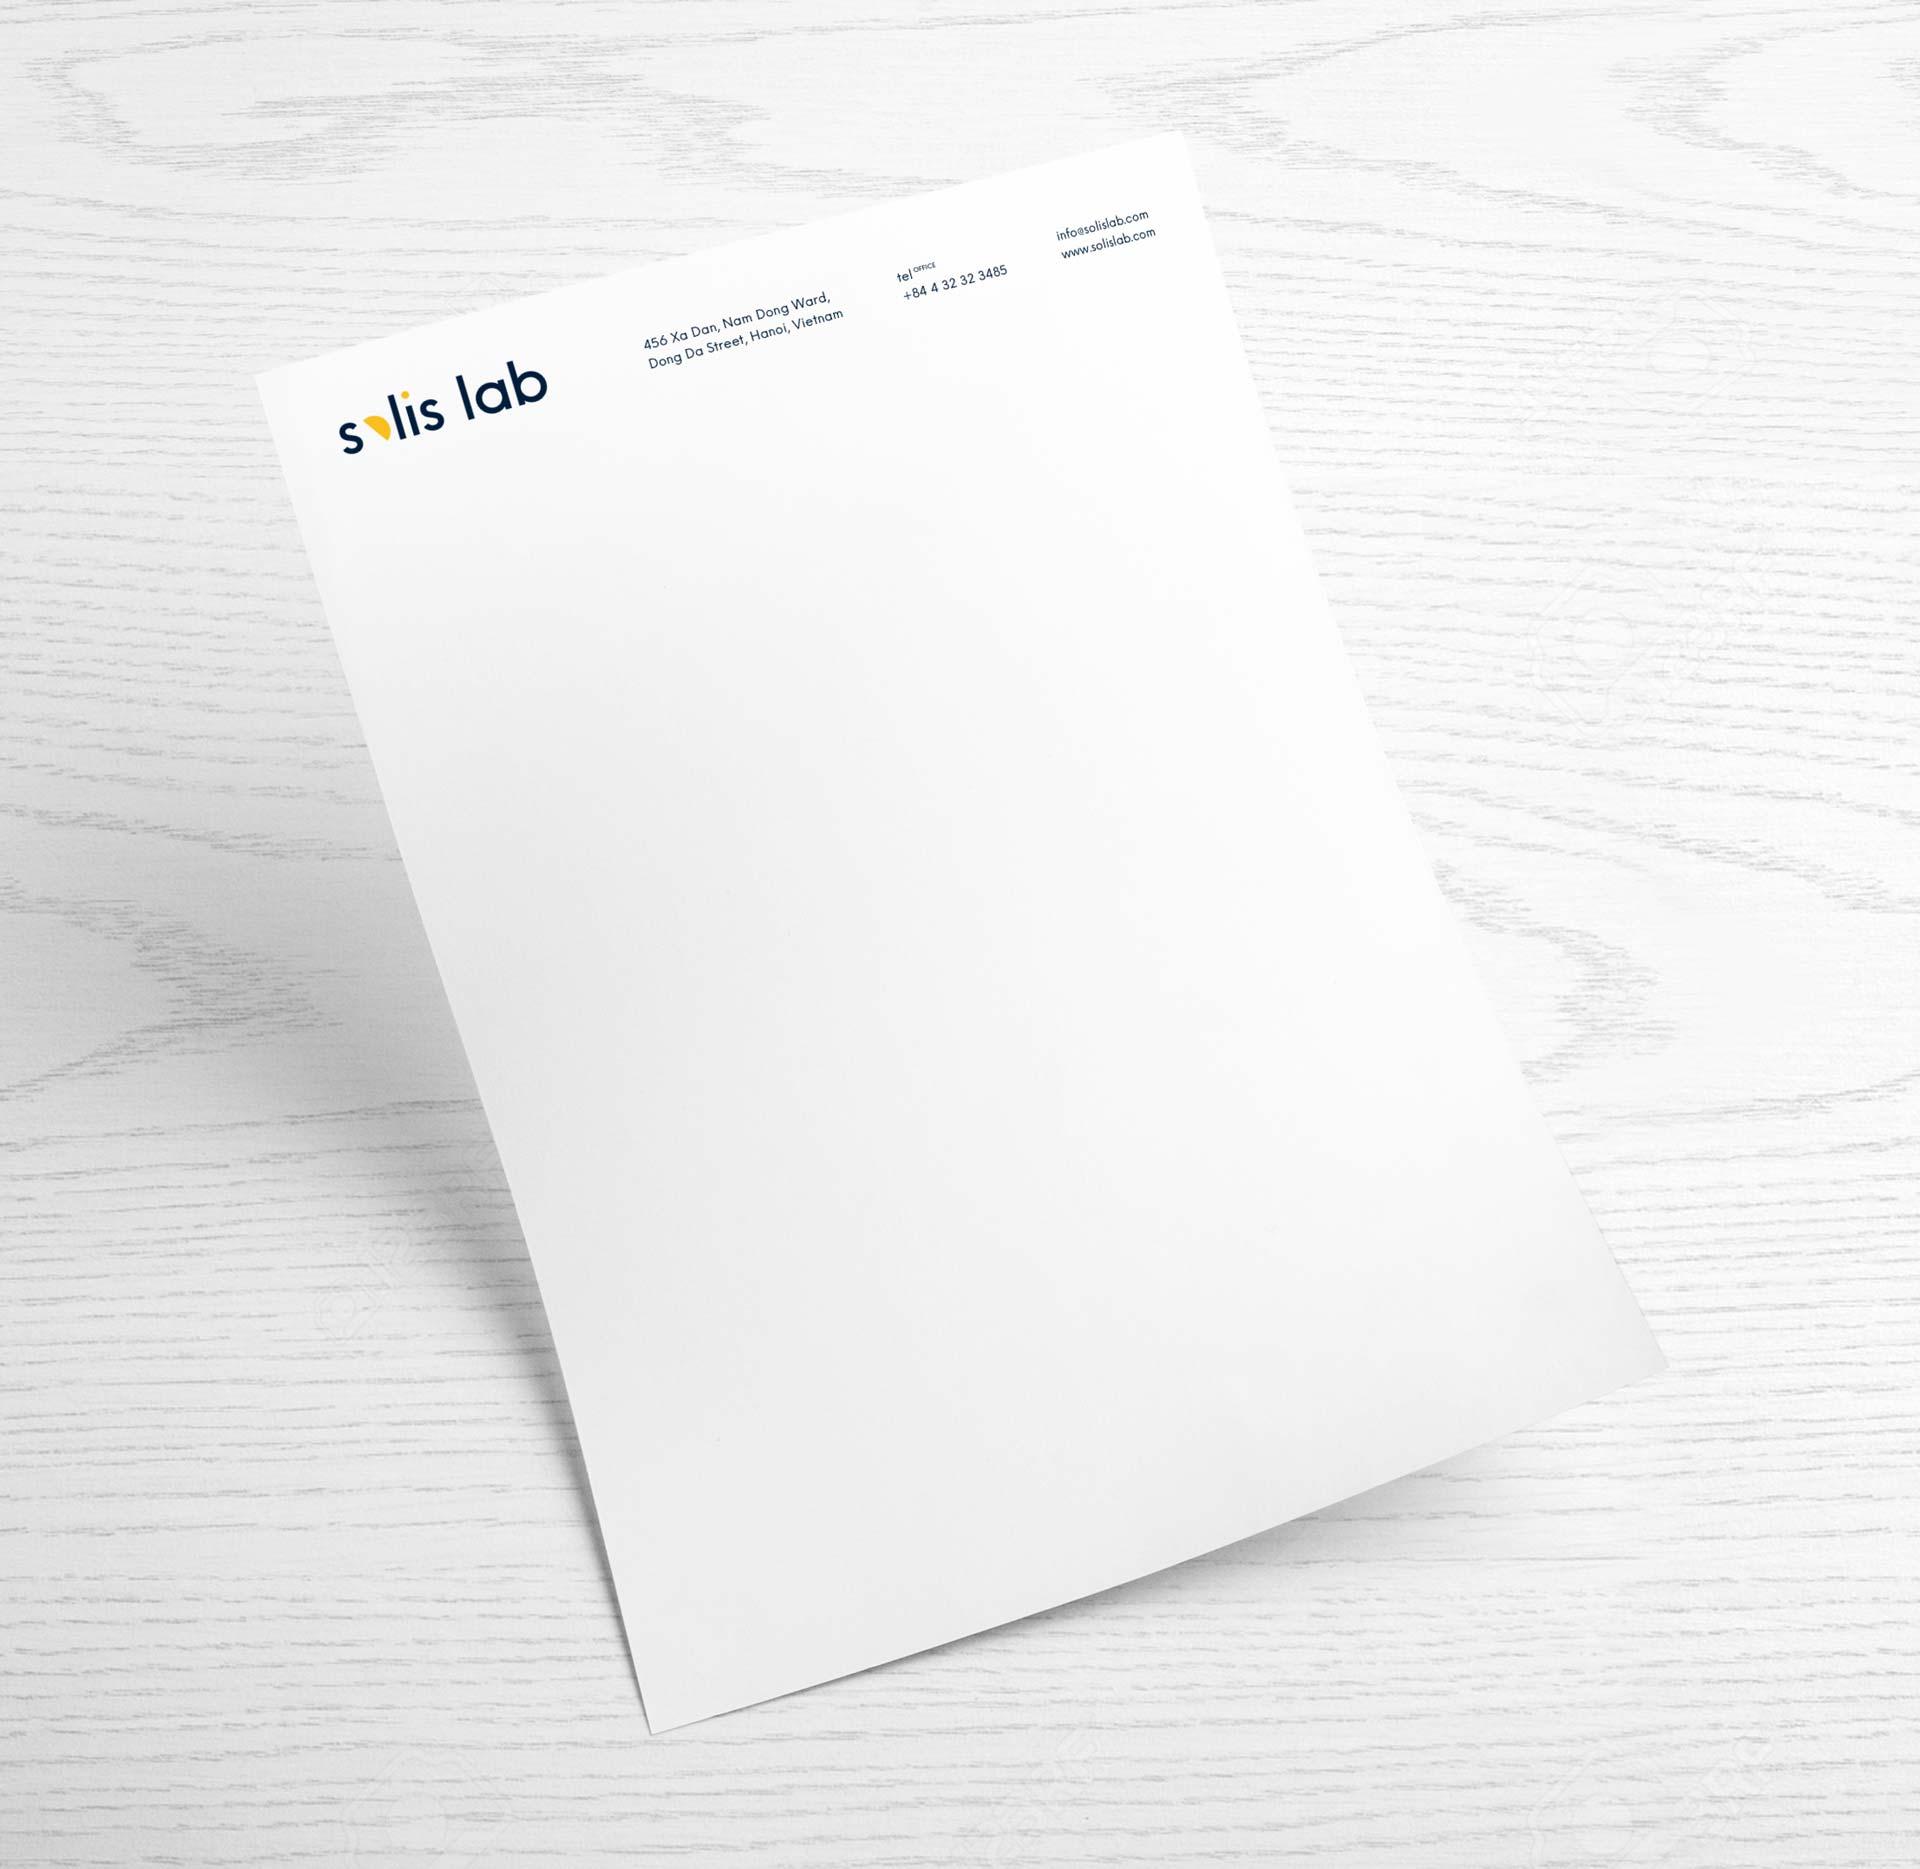 solis lab - letterhead design